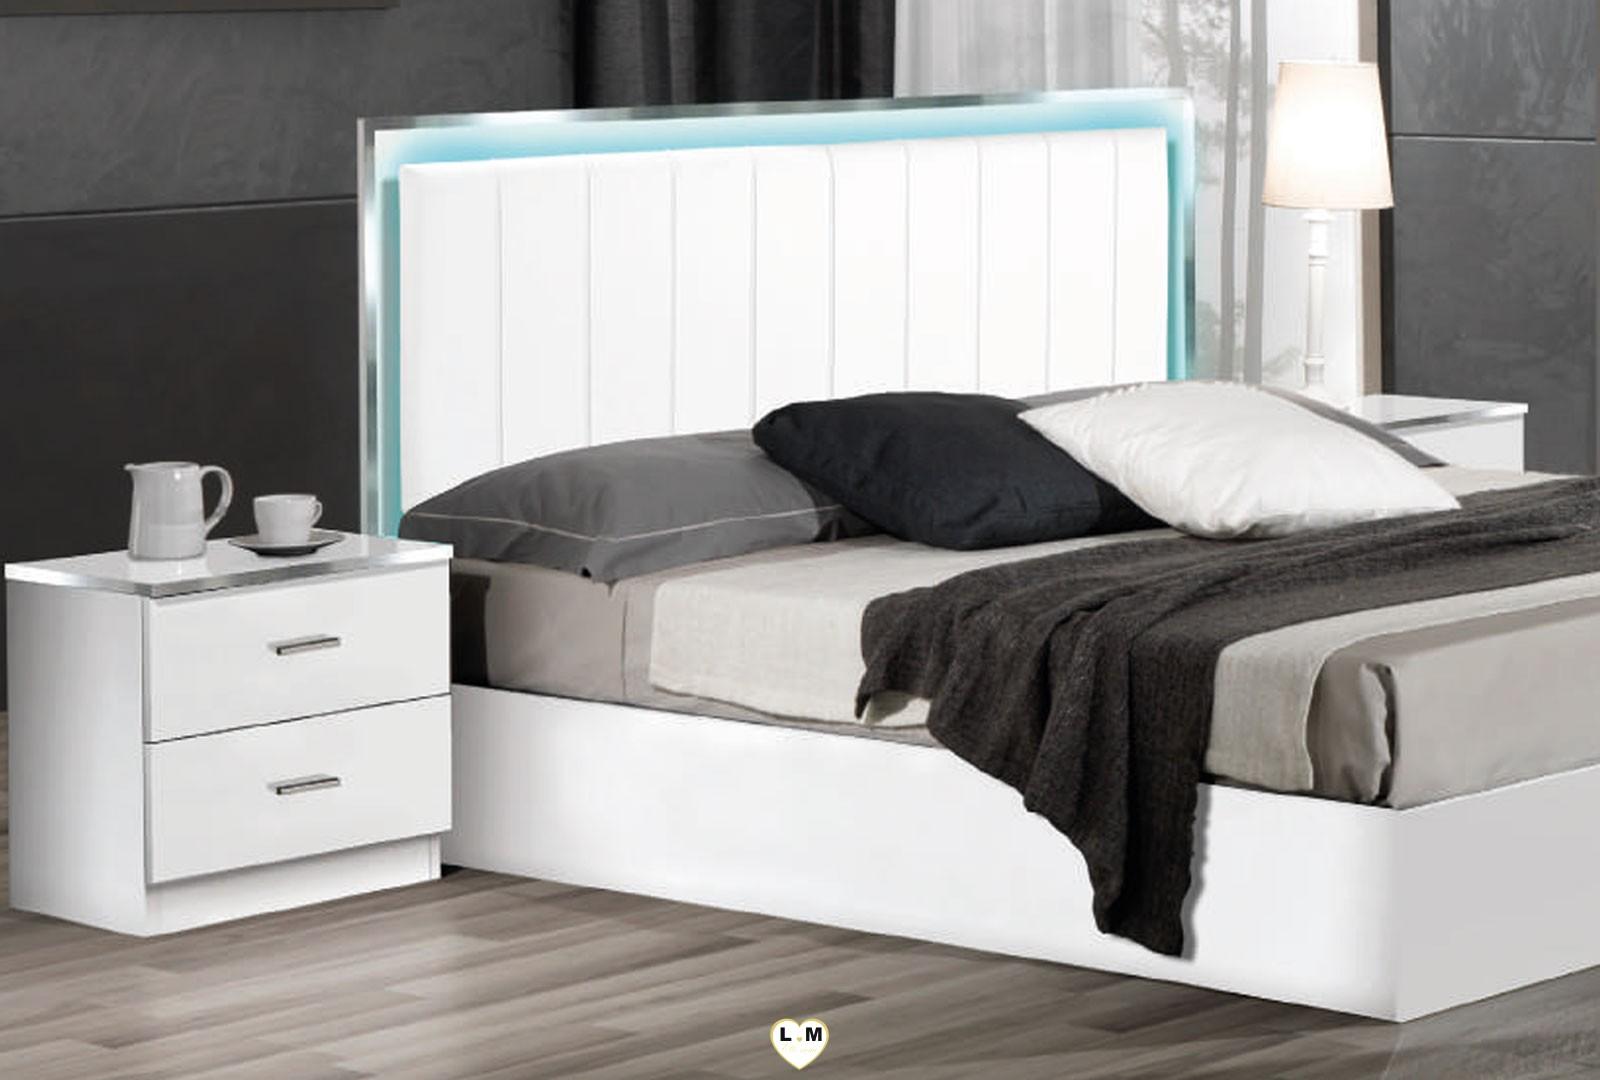 samba laque blanc ensemble chambre a coucher design lignemeuble com. Black Bedroom Furniture Sets. Home Design Ideas